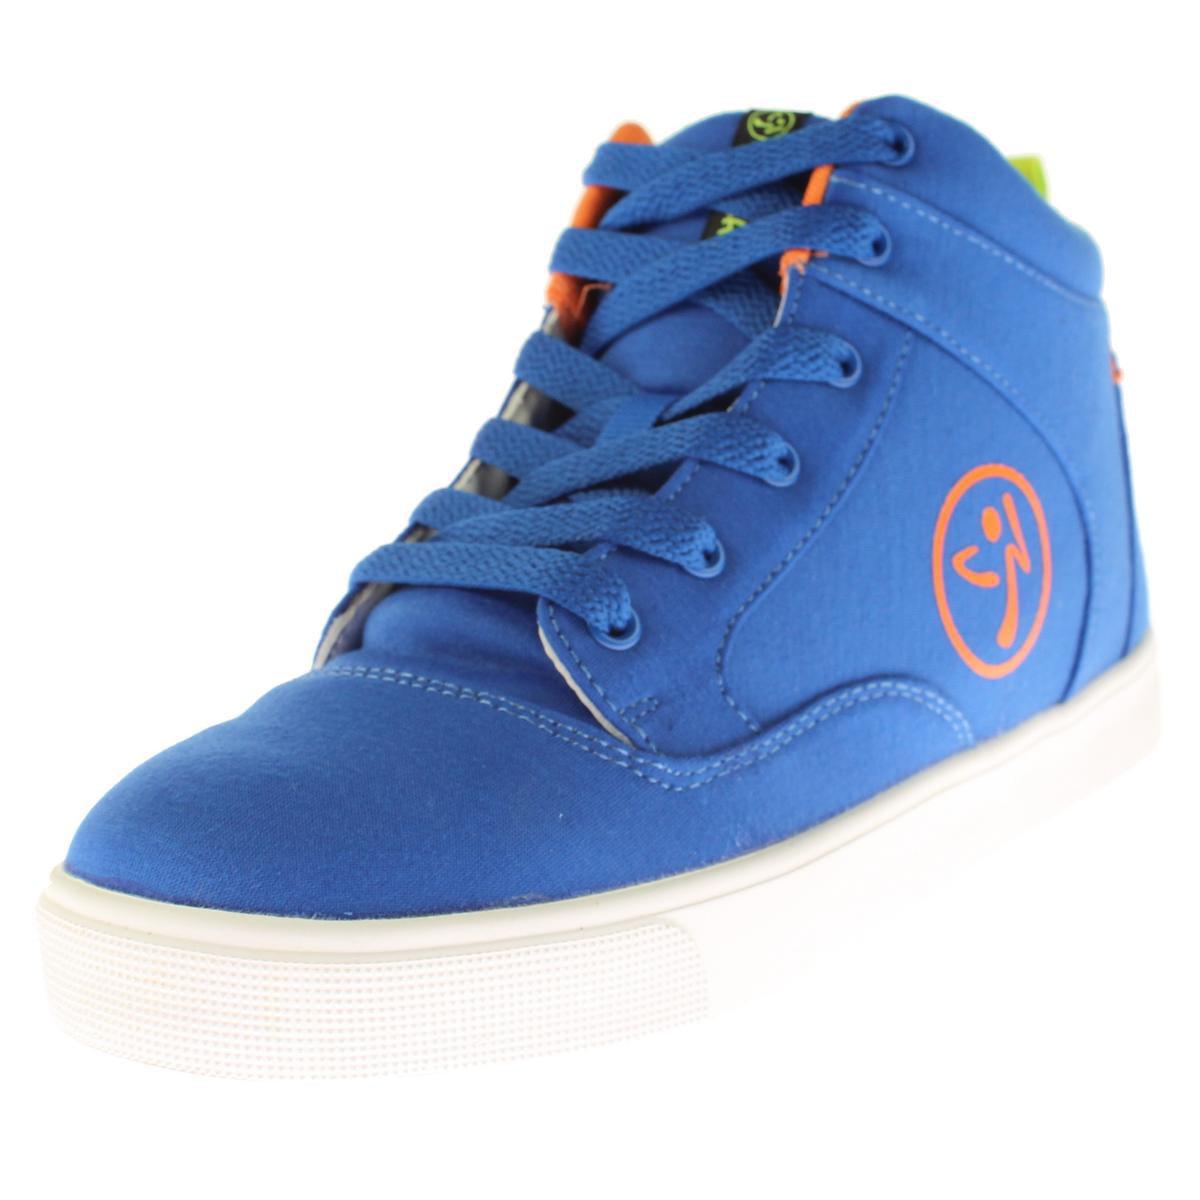 Zumba Womens Street Fresh High Top Contrast Trim Dance Shoes by Zumba